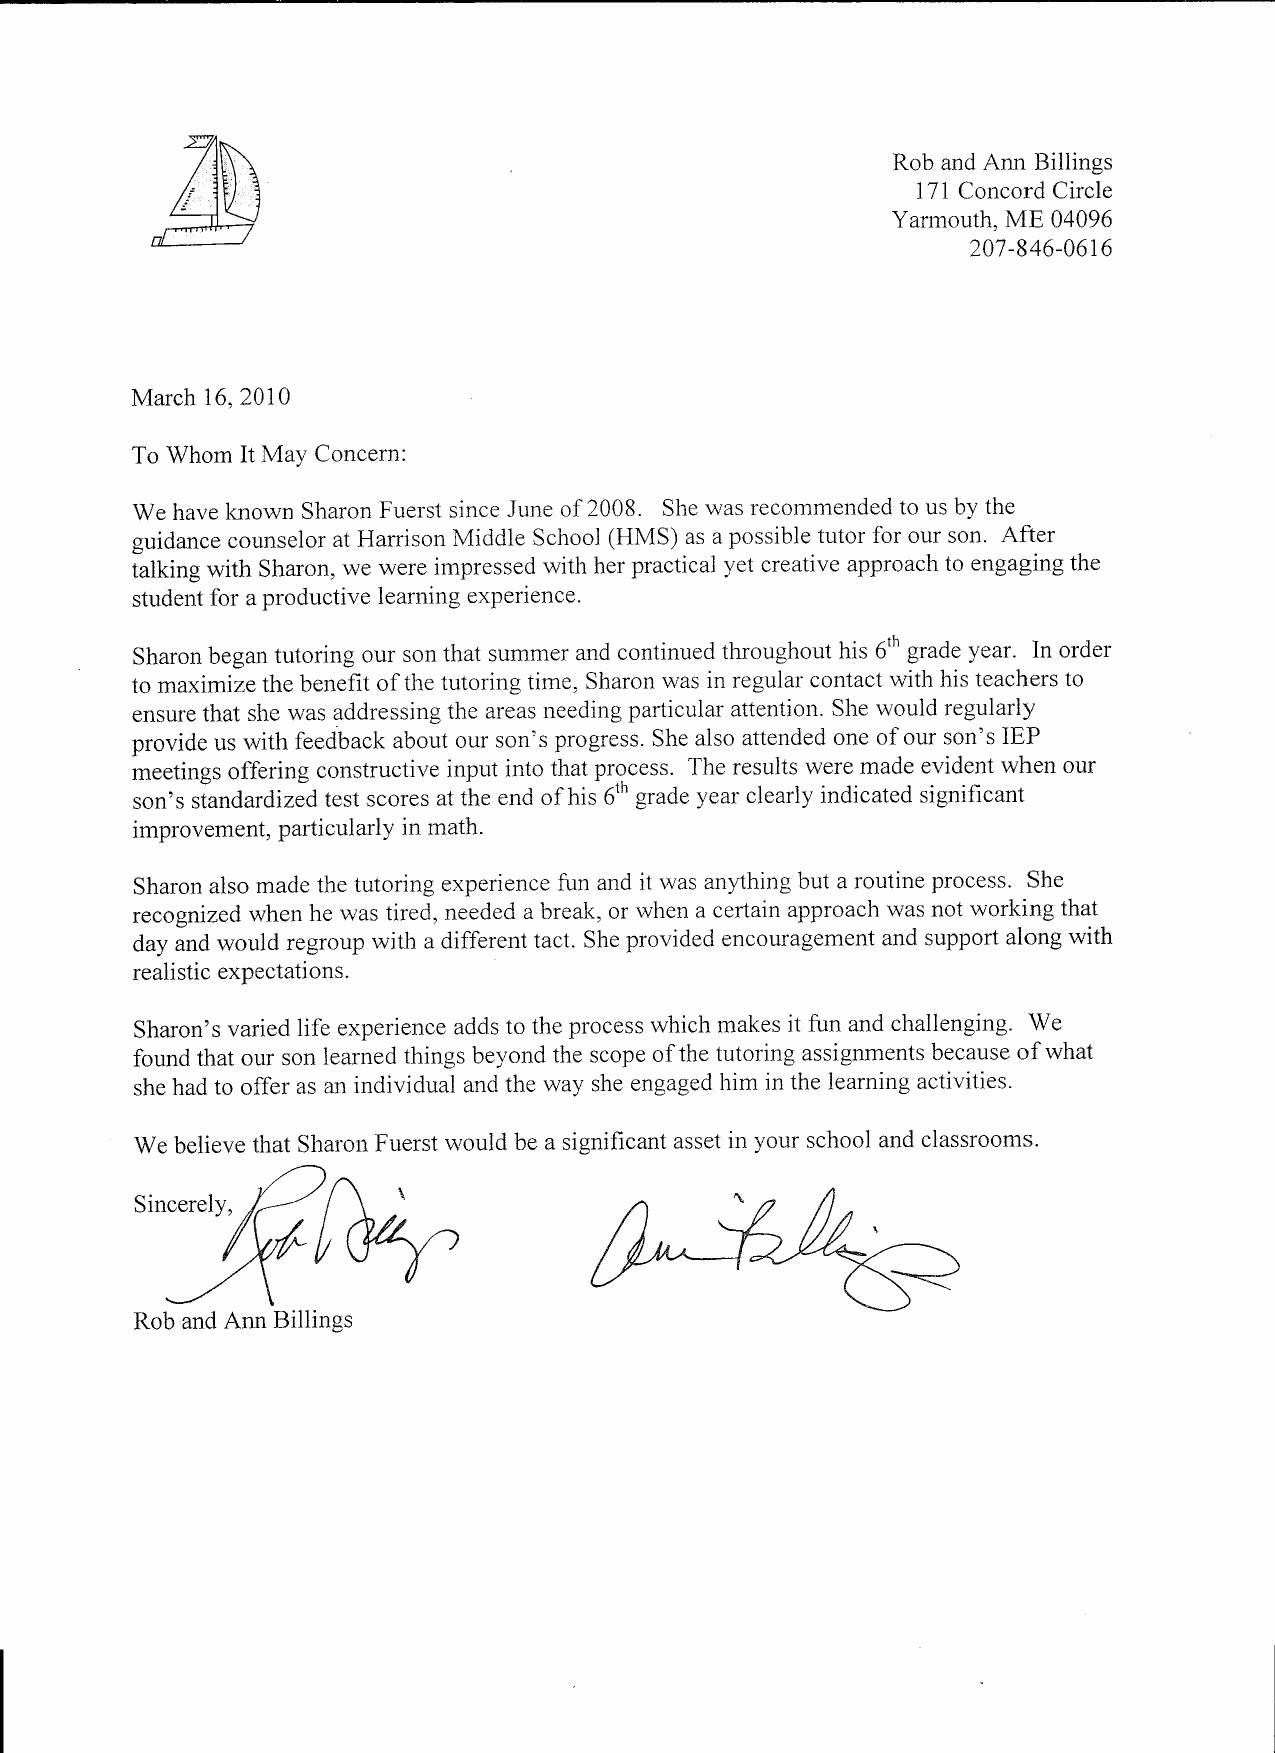 Format Of A Recomendation Letter Best Of Letter Of Re Mendation format